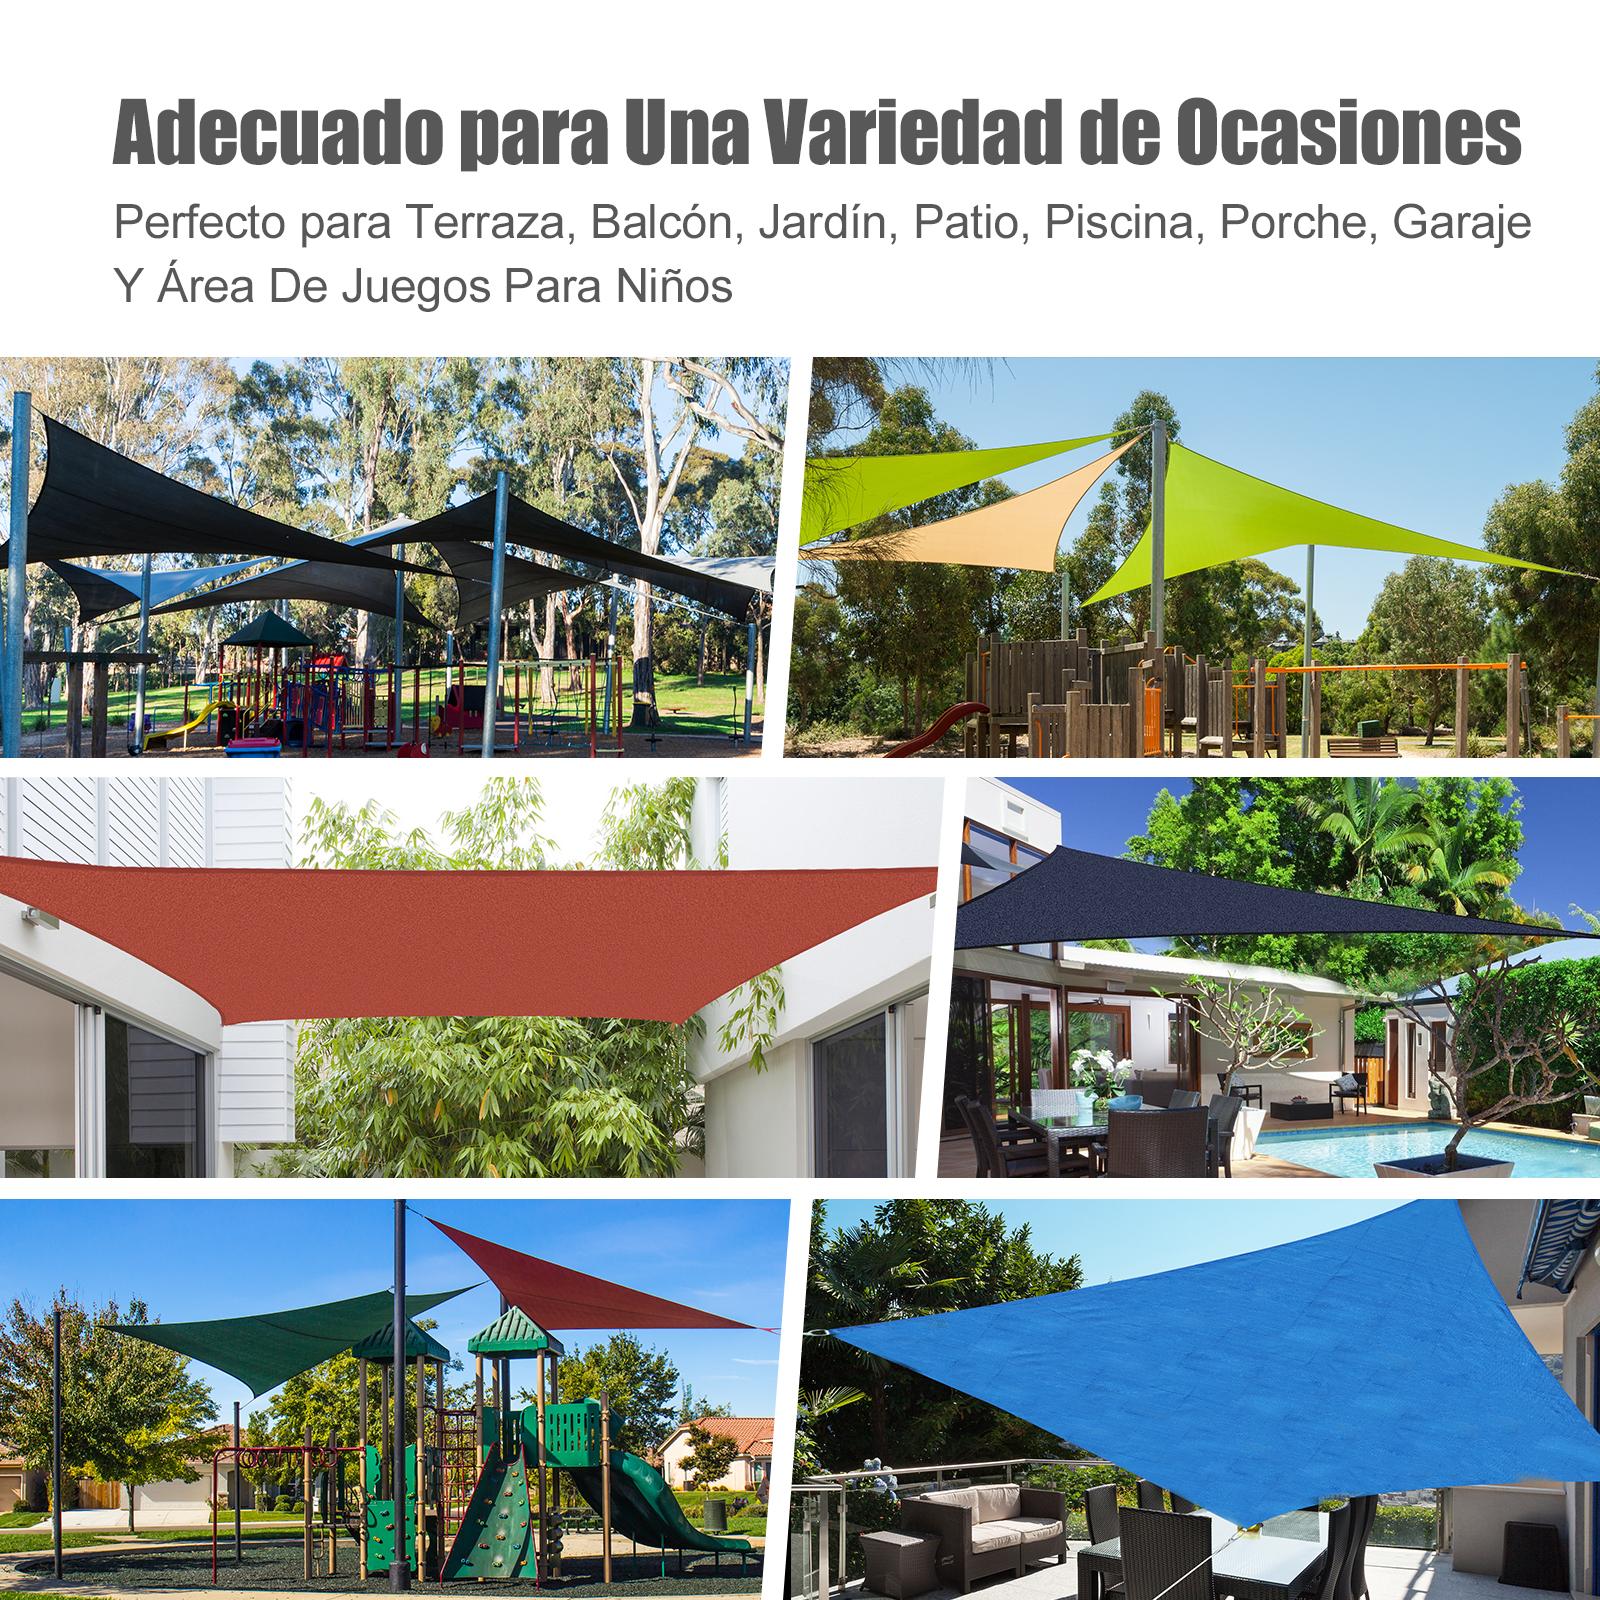 Toldo-Vela-Sombrilla-Parasol-Triangulo-Tejido-de-Poliester-160g-m2-Jardin-Playa miniatura 26